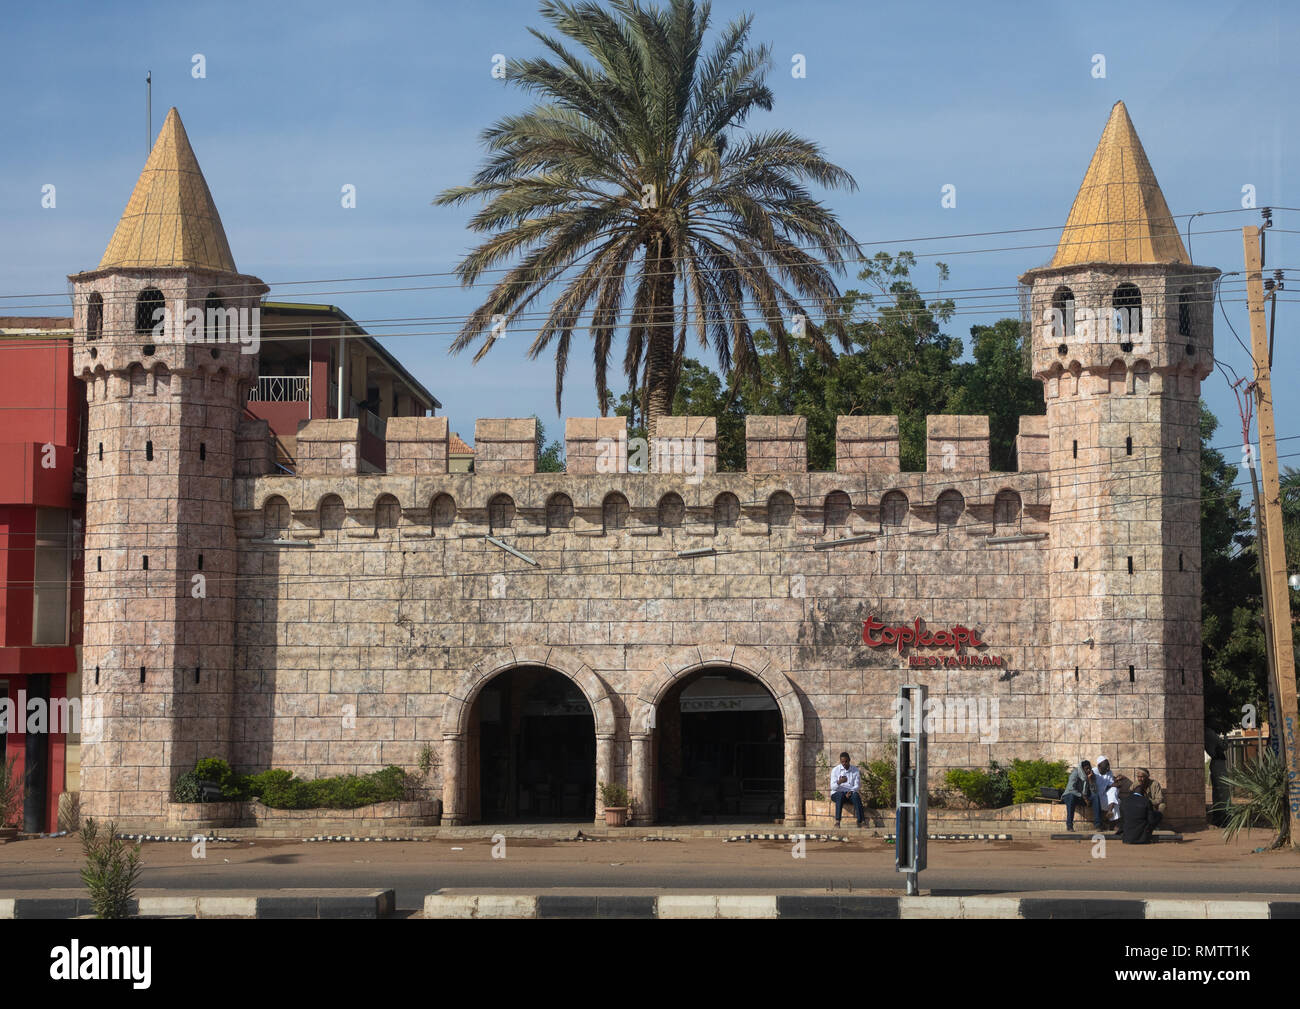 Fake castle hosting topkapi turkish restaurant, Khartoum State, Khartoum, Sudan - Stock Image